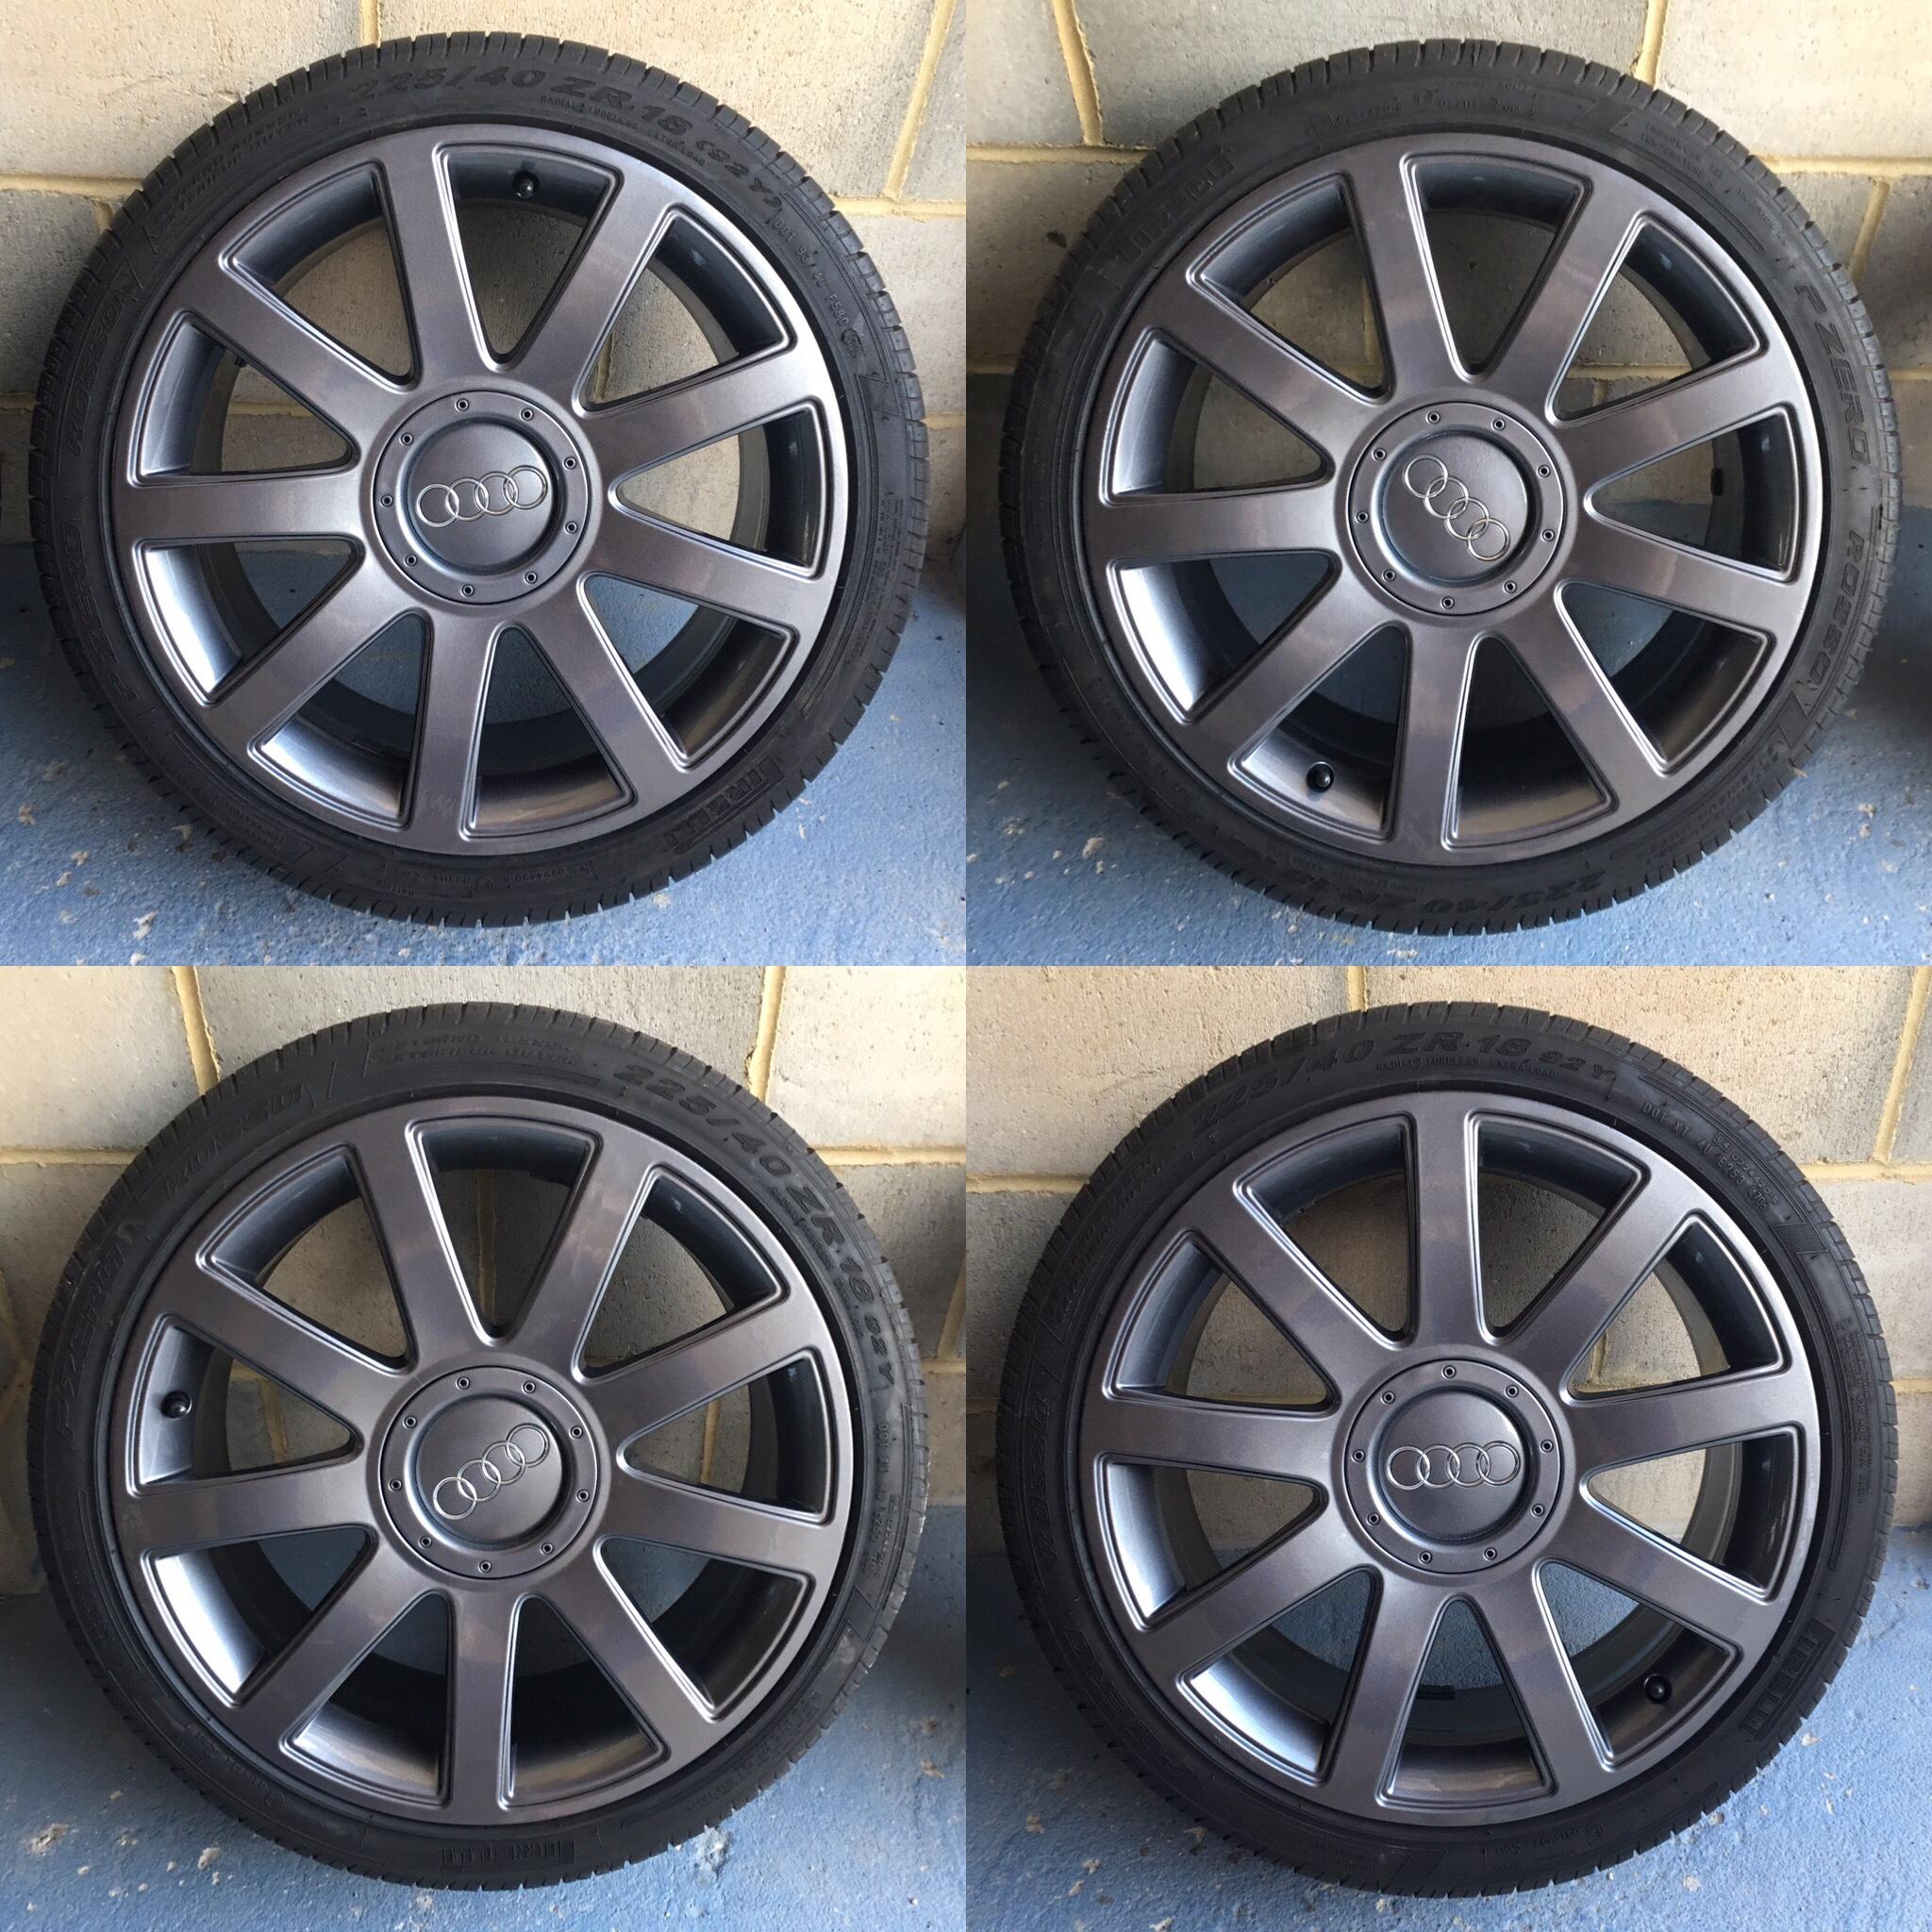 "Genuine 5x100 18"" Audi RS4 TT Mk1 Alloy Wheels"